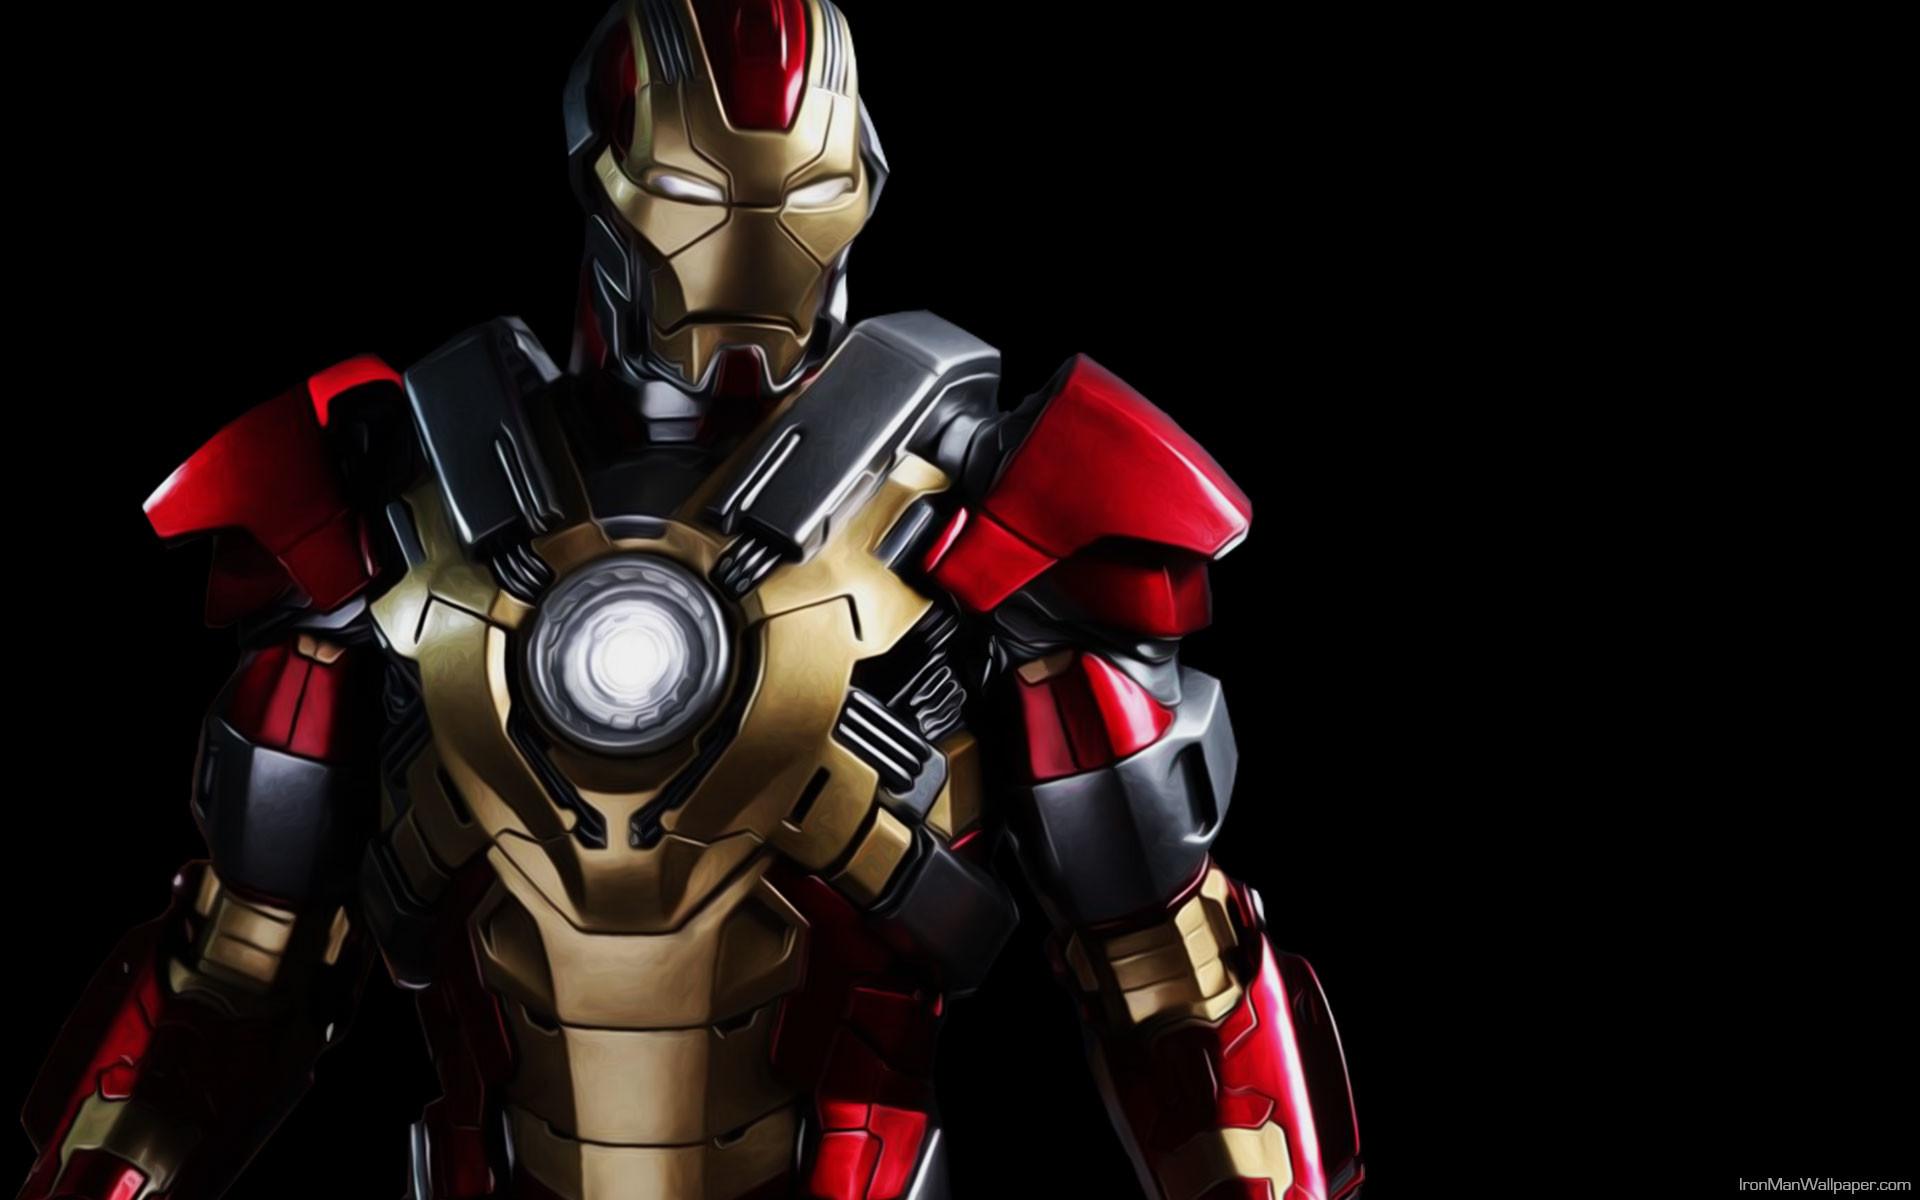 Iron Man Wallpaper HD 1366×768